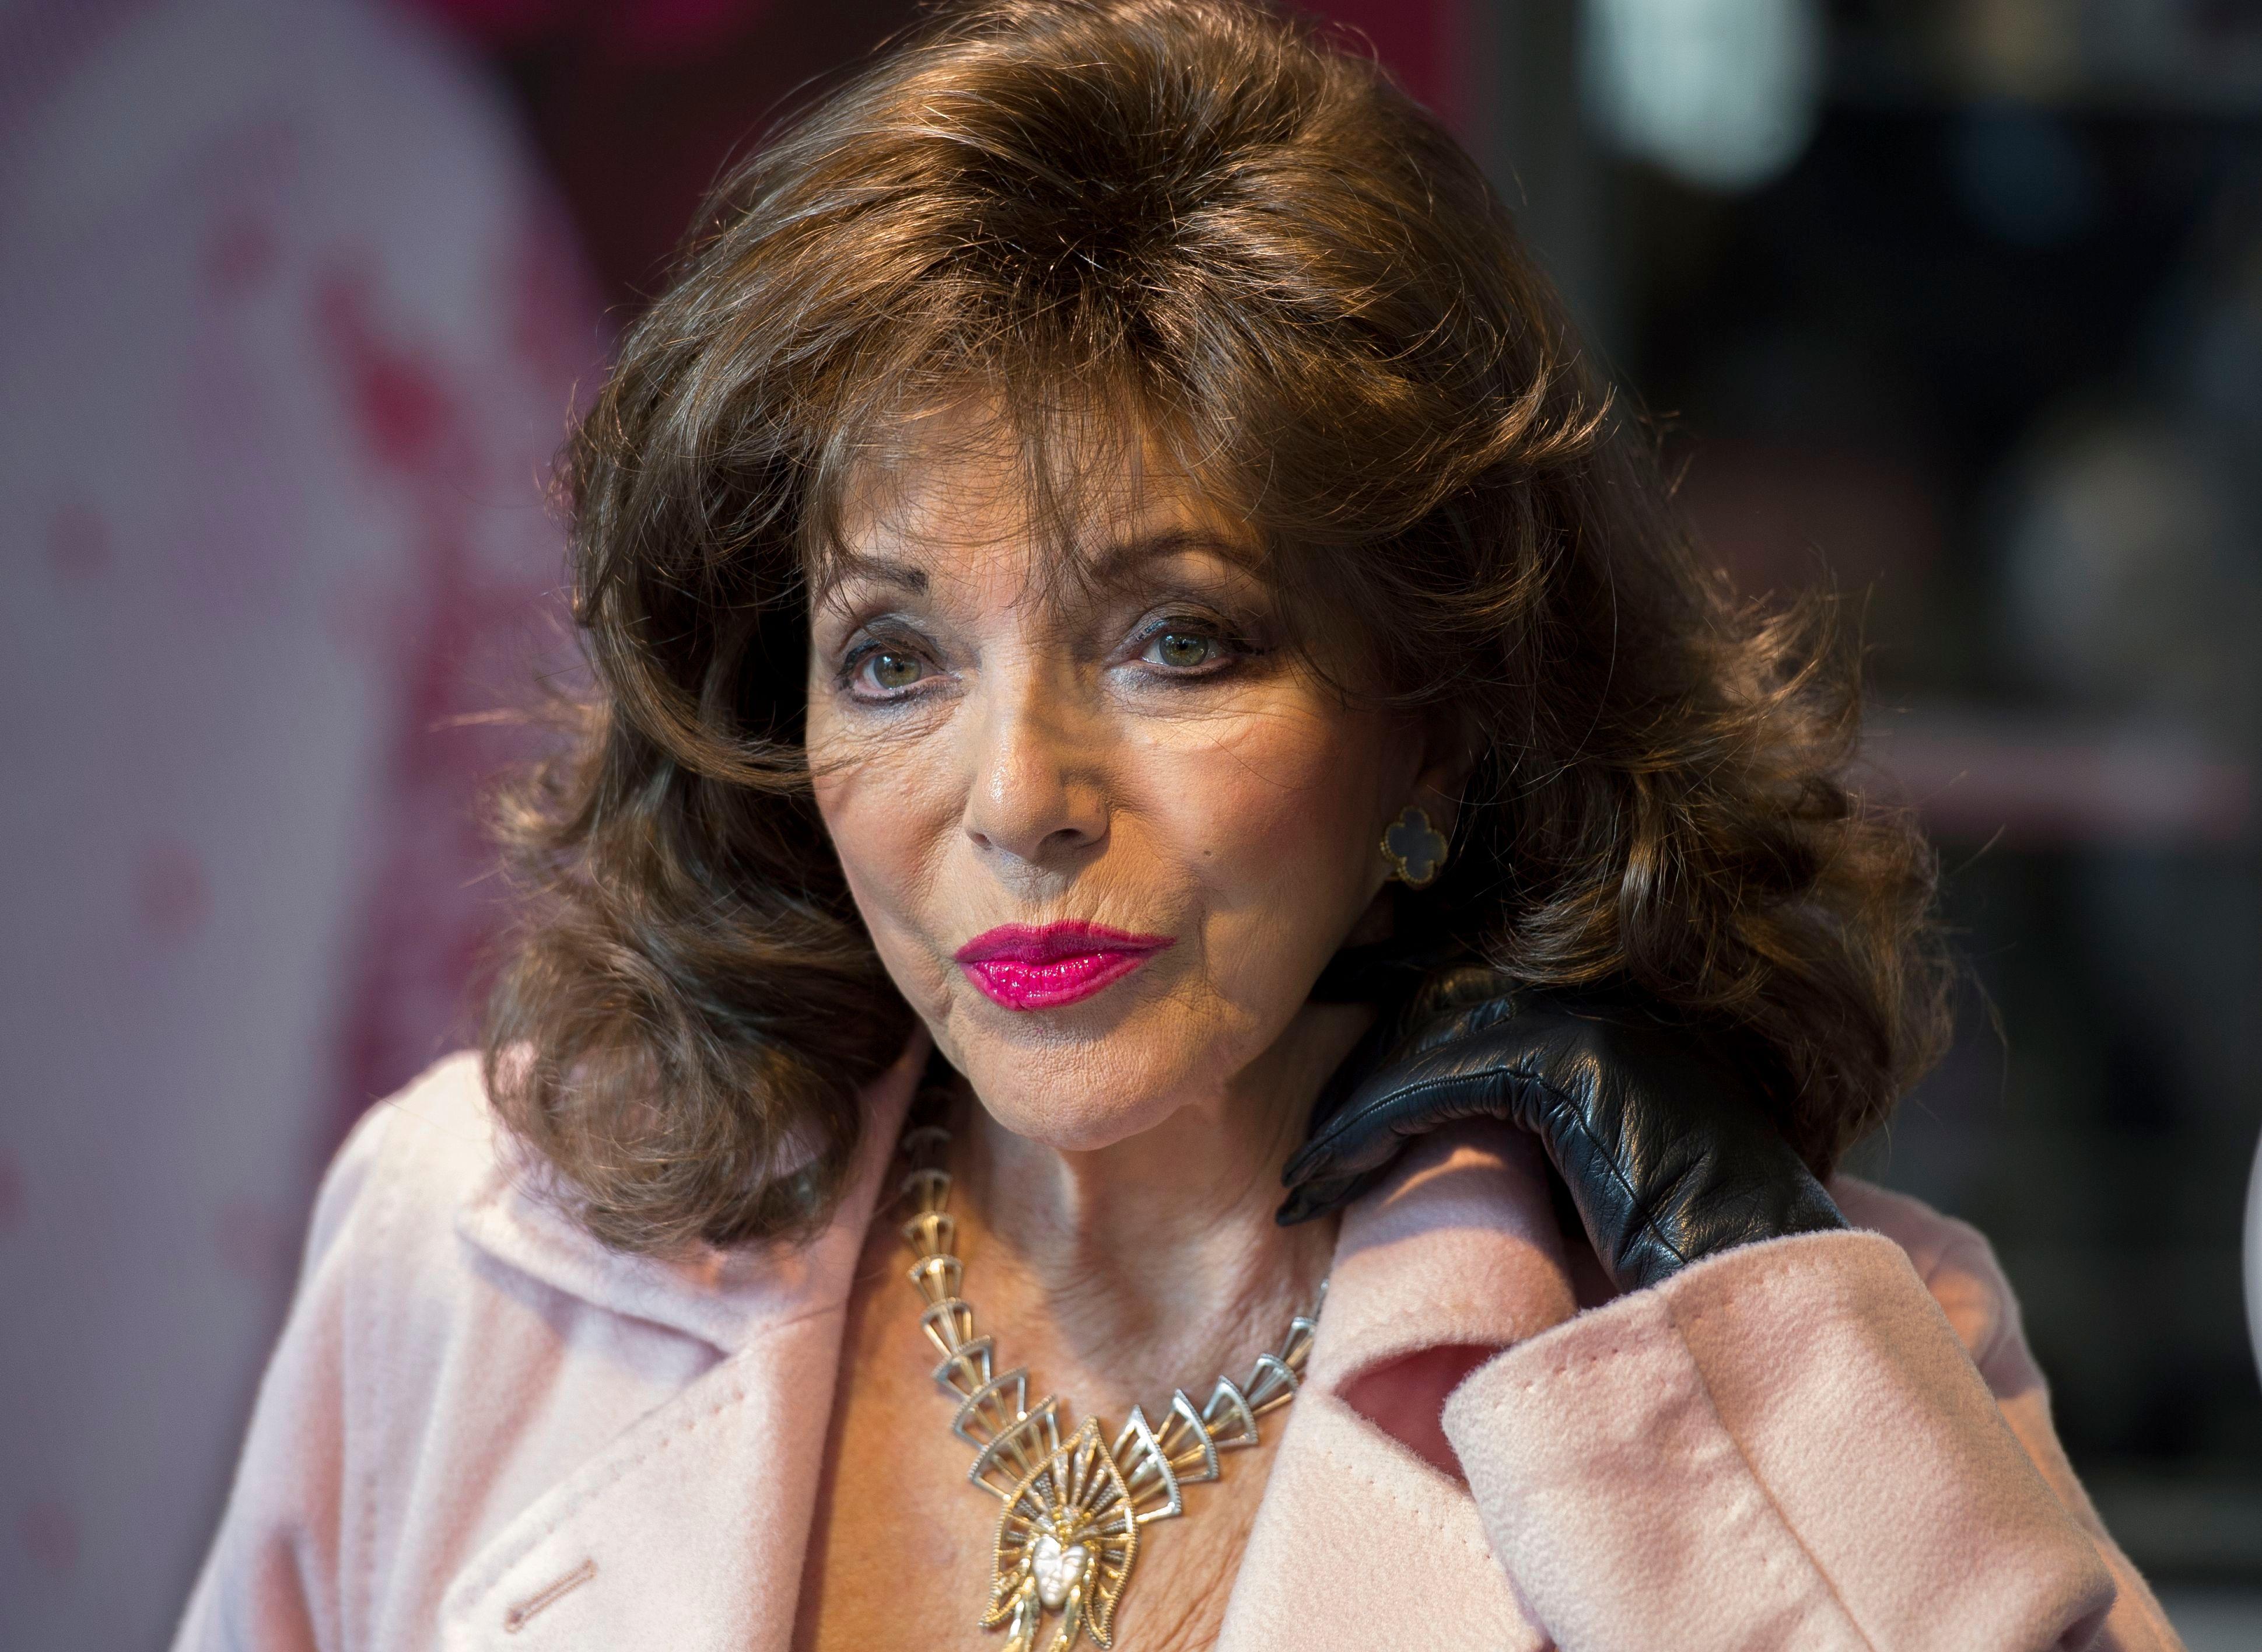 Joan Collins to star in AHS Season 8 - EverydayKoala